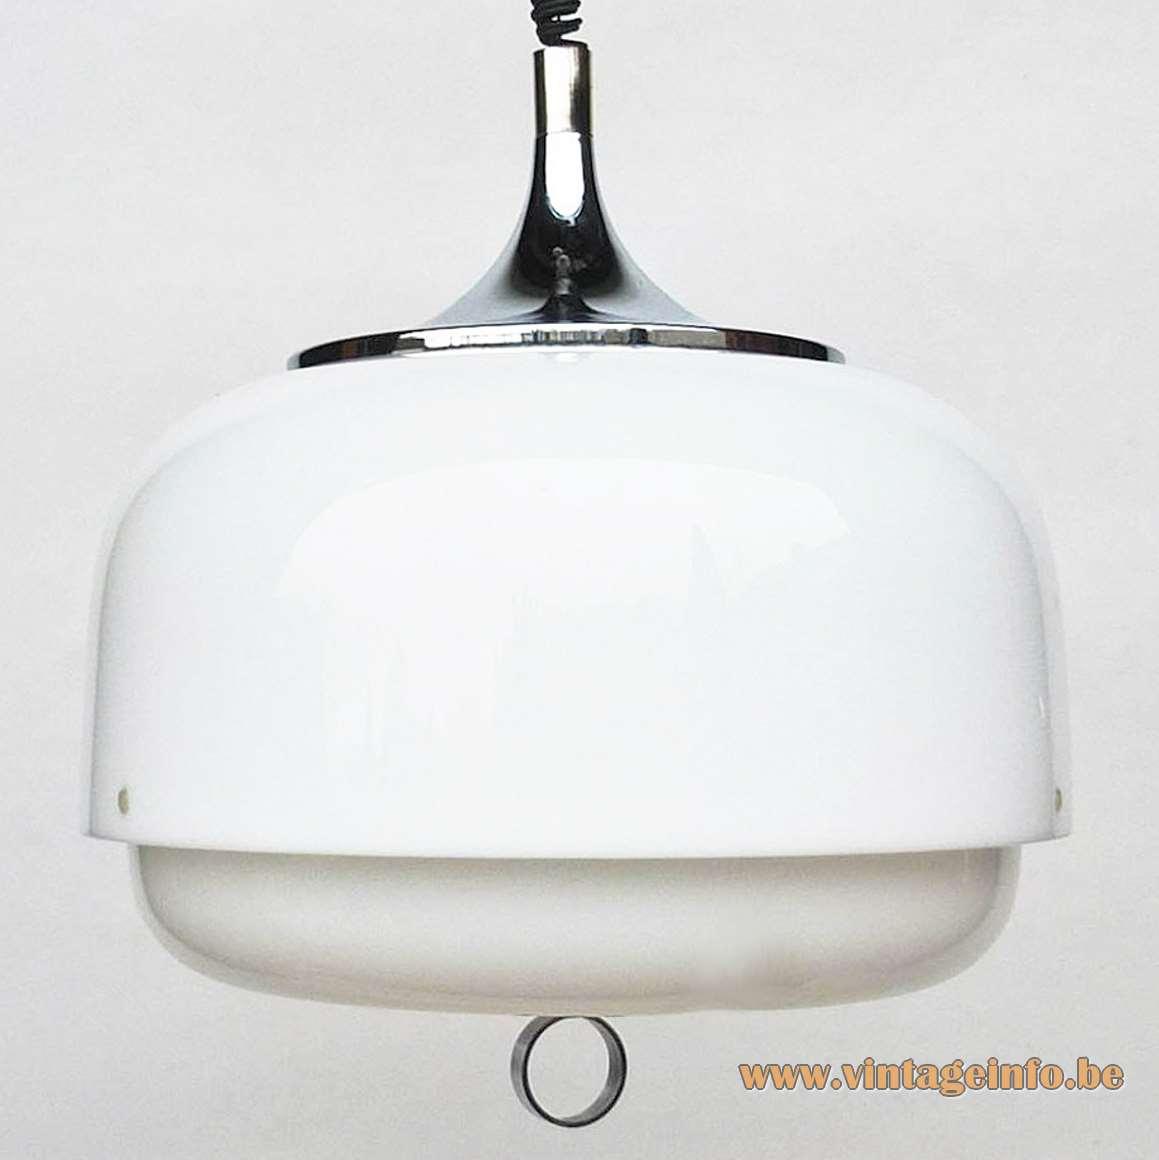 Harvey Guzzini rise & fall pendant lamp Luigi Massoni 1960s 1970s acrylic chrome Rolly Italy E27 socket